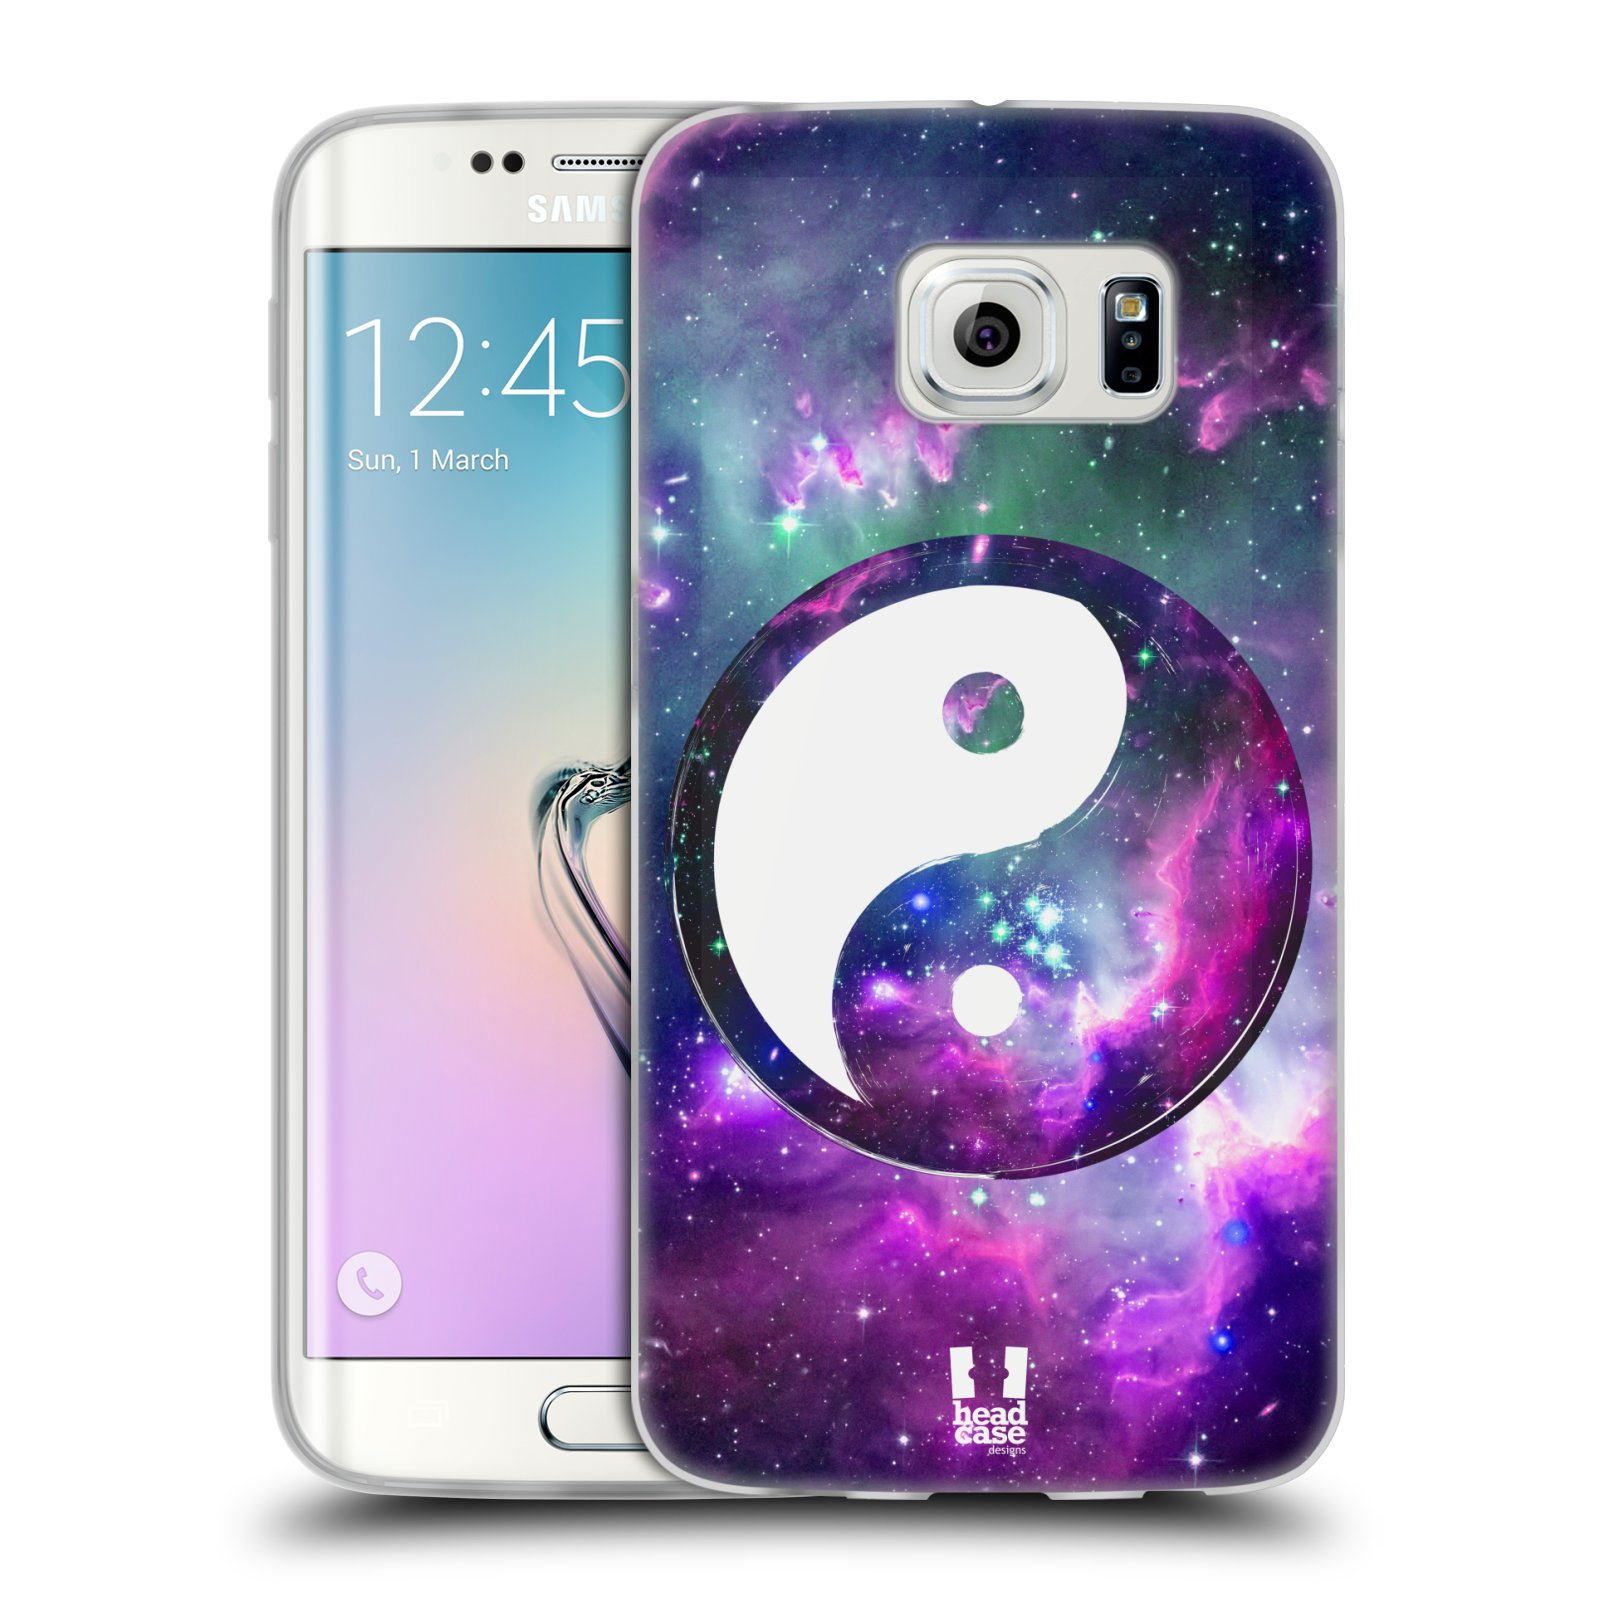 Silikonové pouzdro na mobil Samsung Galaxy S6 Edge HEAD CASE YIn a Yang PURPLE (Silikonový kryt či obal na mobilní telefon Samsung Galaxy S6 Edge SM-G925F)